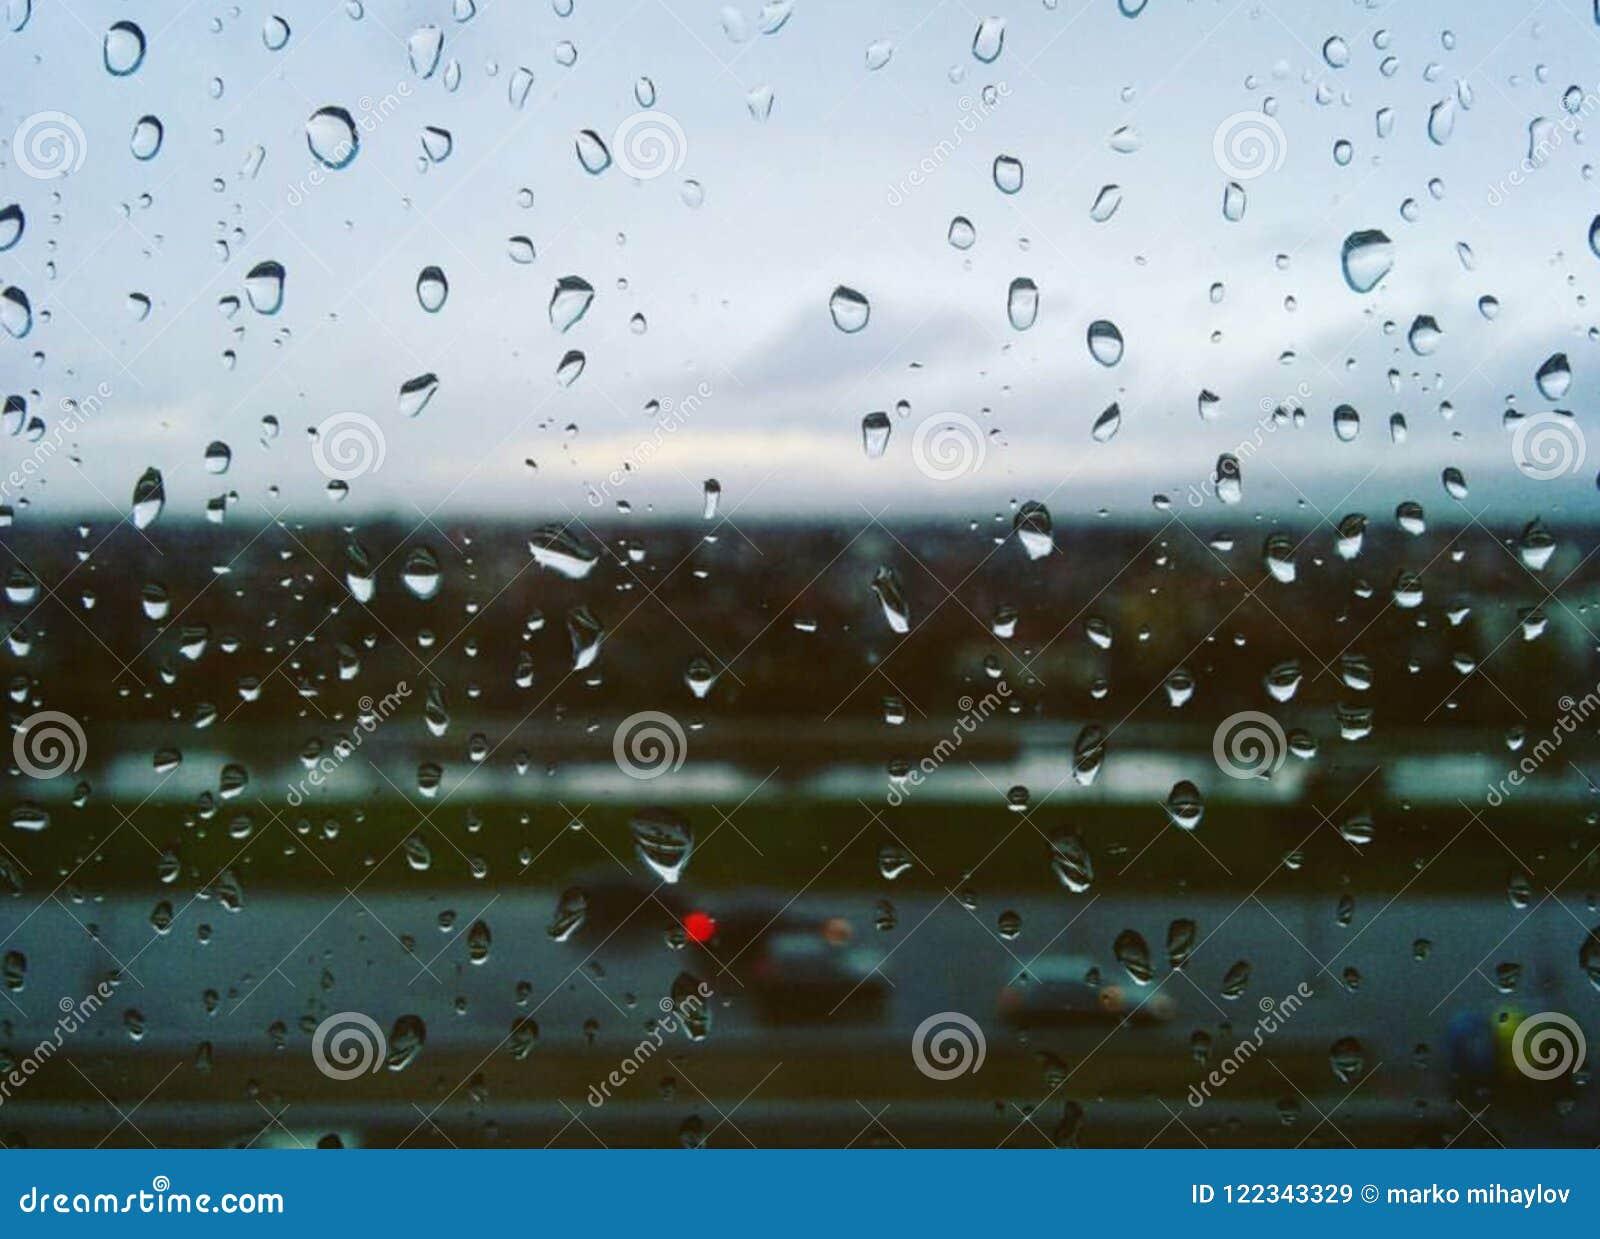 rain drops on window stock image image of window water 122343329